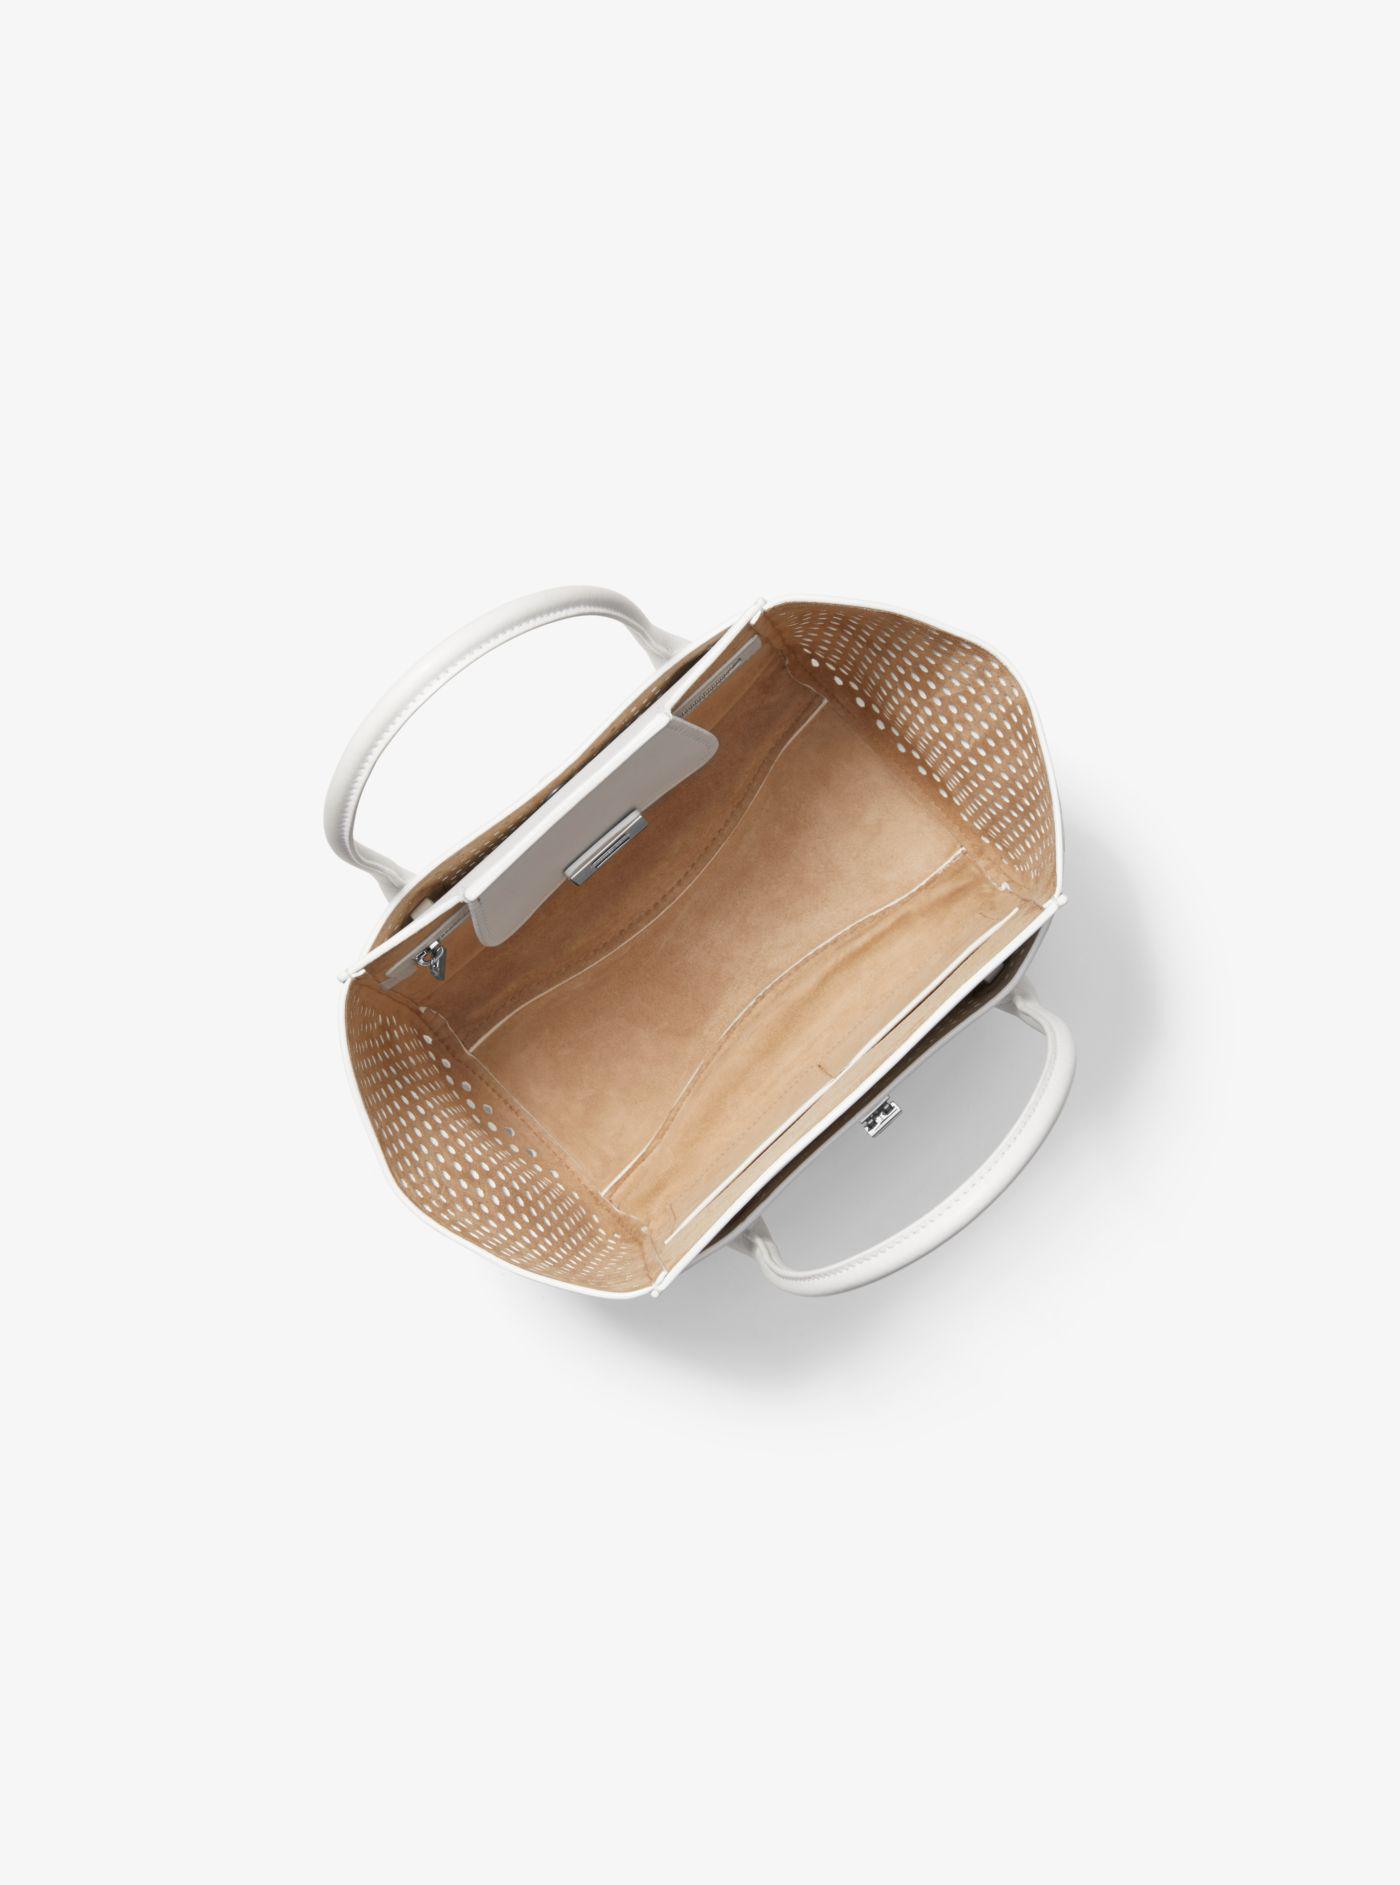 2b43145ea481 Michael Kors - White Bancroft Medium Perforated Calf Leather Satchel -  Lyst. View fullscreen